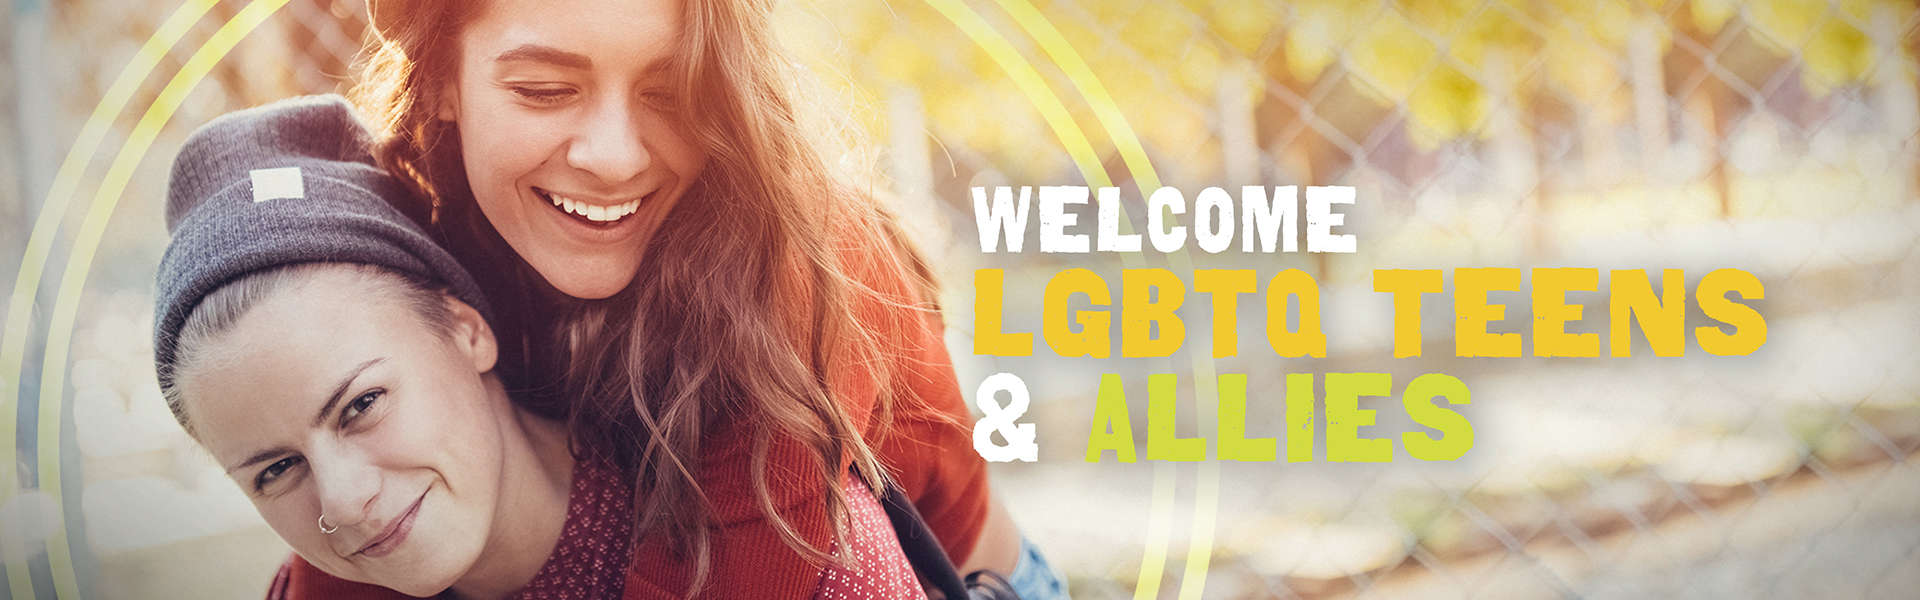 Welcome LGBTQ Teens & Allies